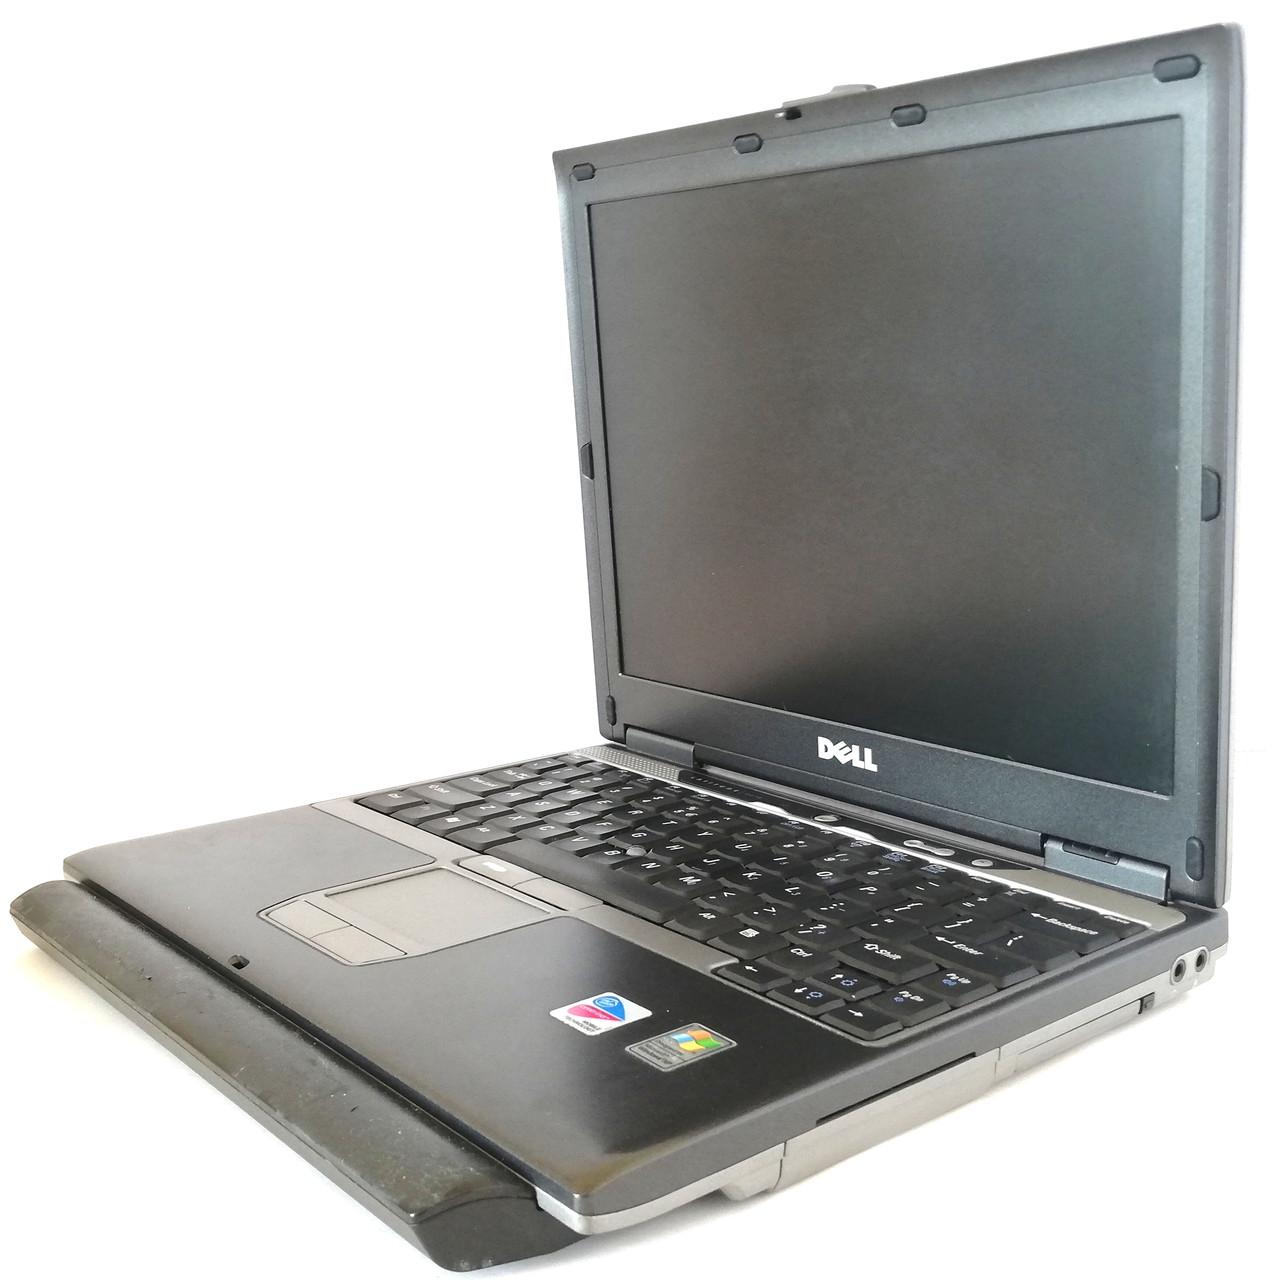 "Ноутбук DELL Latitude D410 12"" Intel Pentium M 750 1.8 ГГц 1 ГБ Б/У"